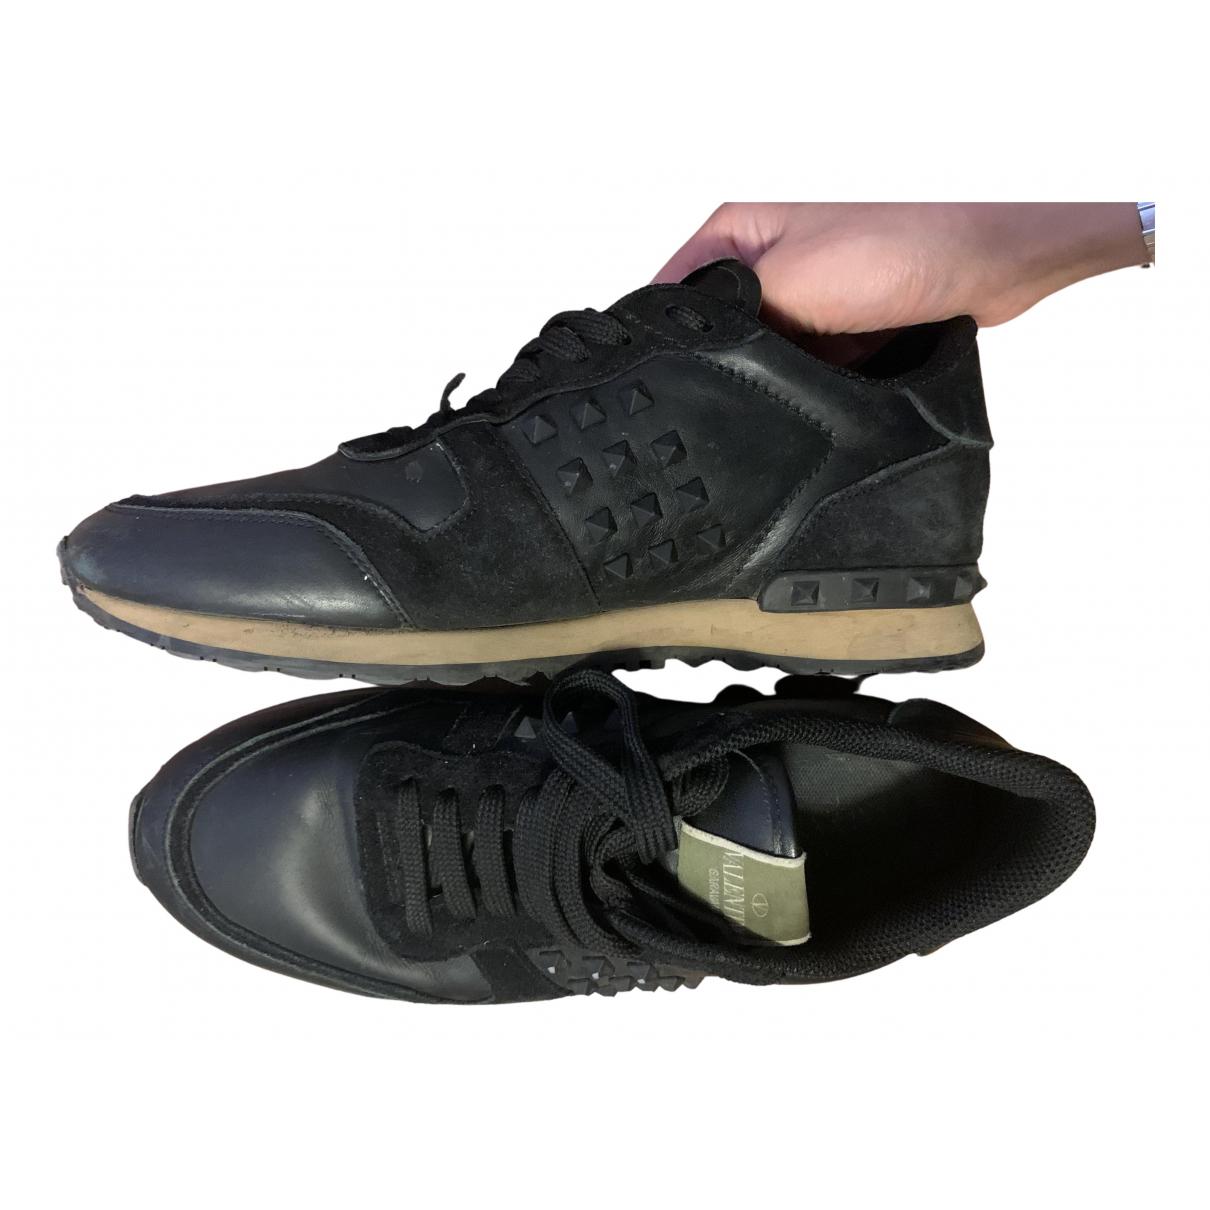 Valentino Garavani - Baskets Rockrunner pour homme en cuir - noir